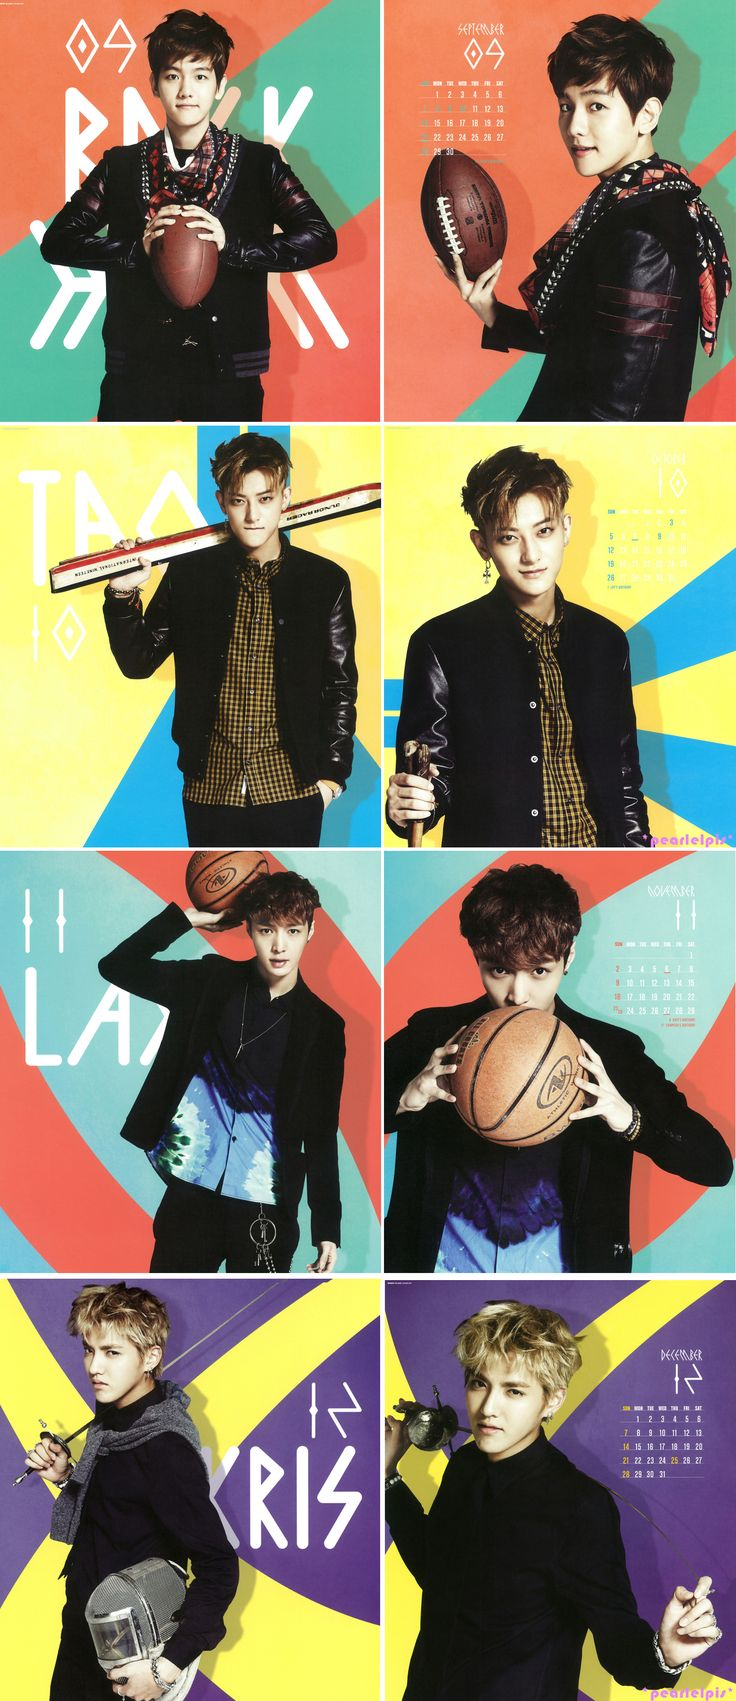 Exo 2014 Calendar (3/3) : Baekhyun, Tao, Lay, Kris